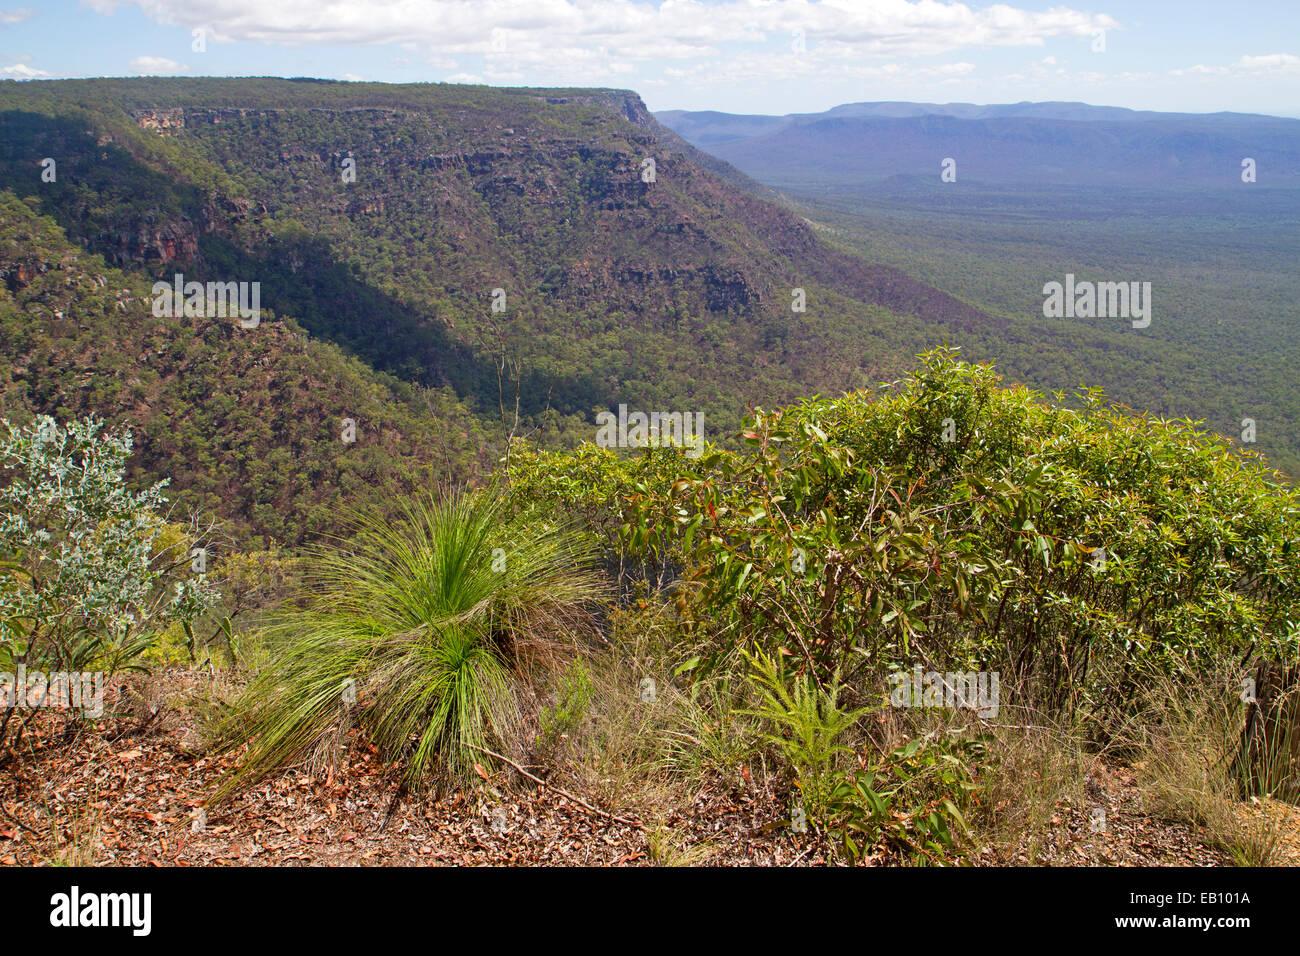 View across the escarpment of the Blackdown Tableland National Park - Stock Image